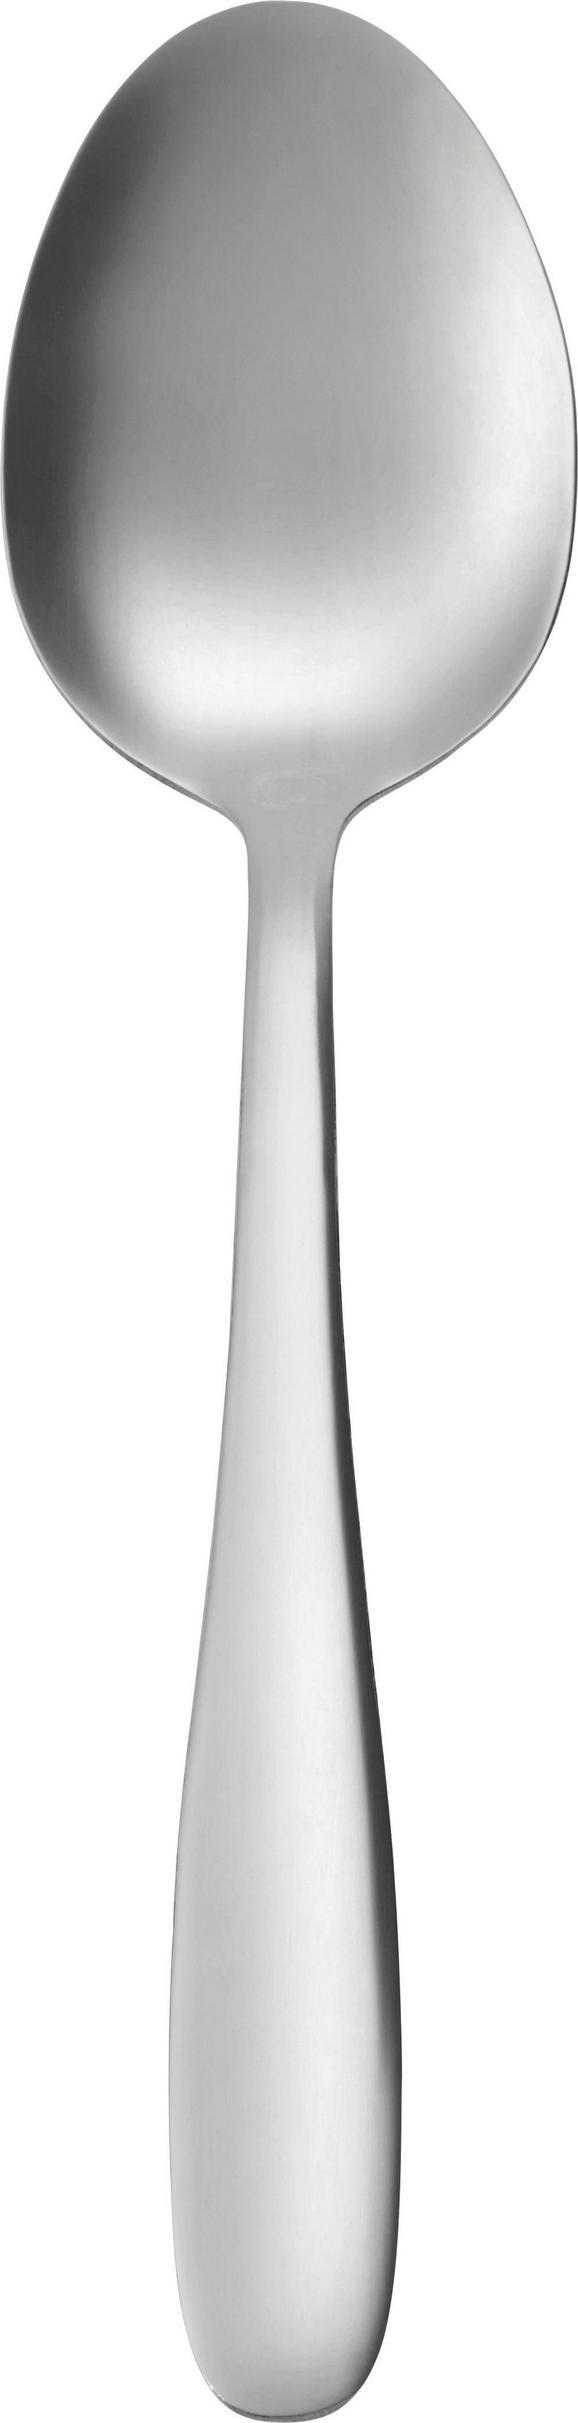 Löffel Demi in Edelstahl - Edelstahlfarben, KONVENTIONELL, Metall (19,5cm) - Mömax modern living